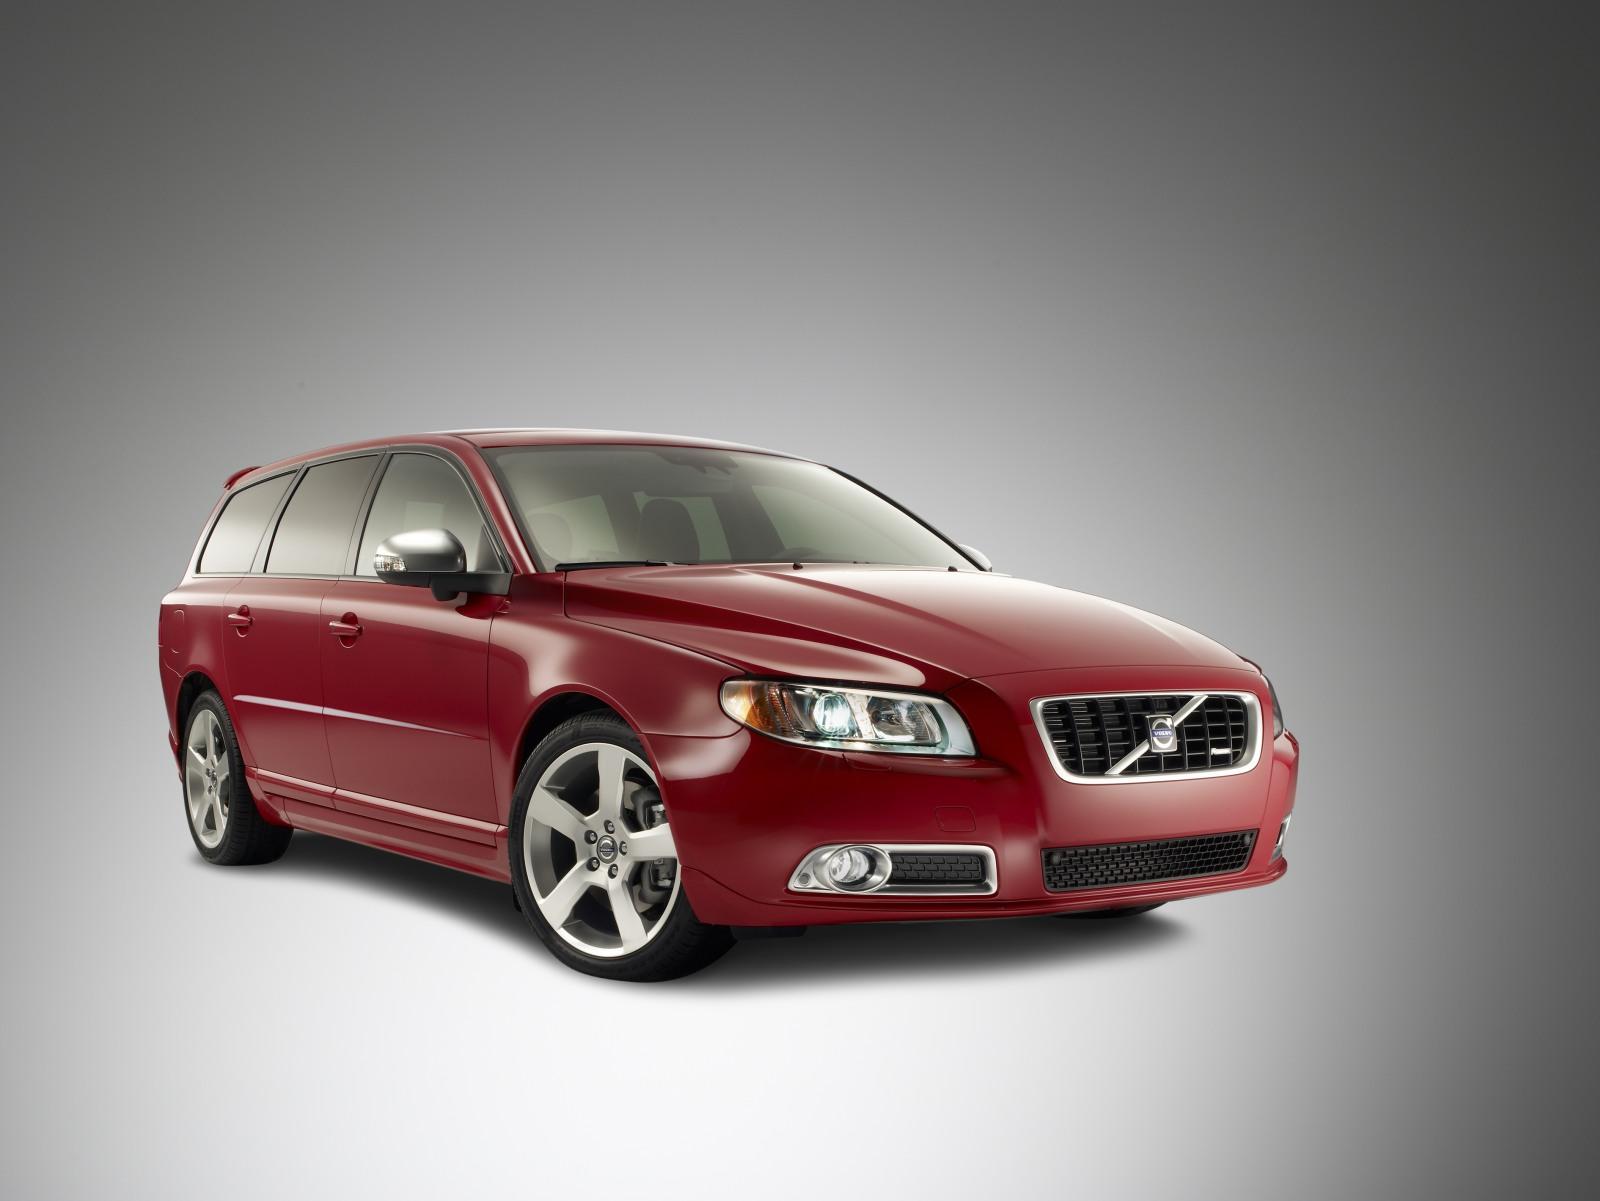 Erfolgskombi mit Sportsgeist Volvo V70 im R Design